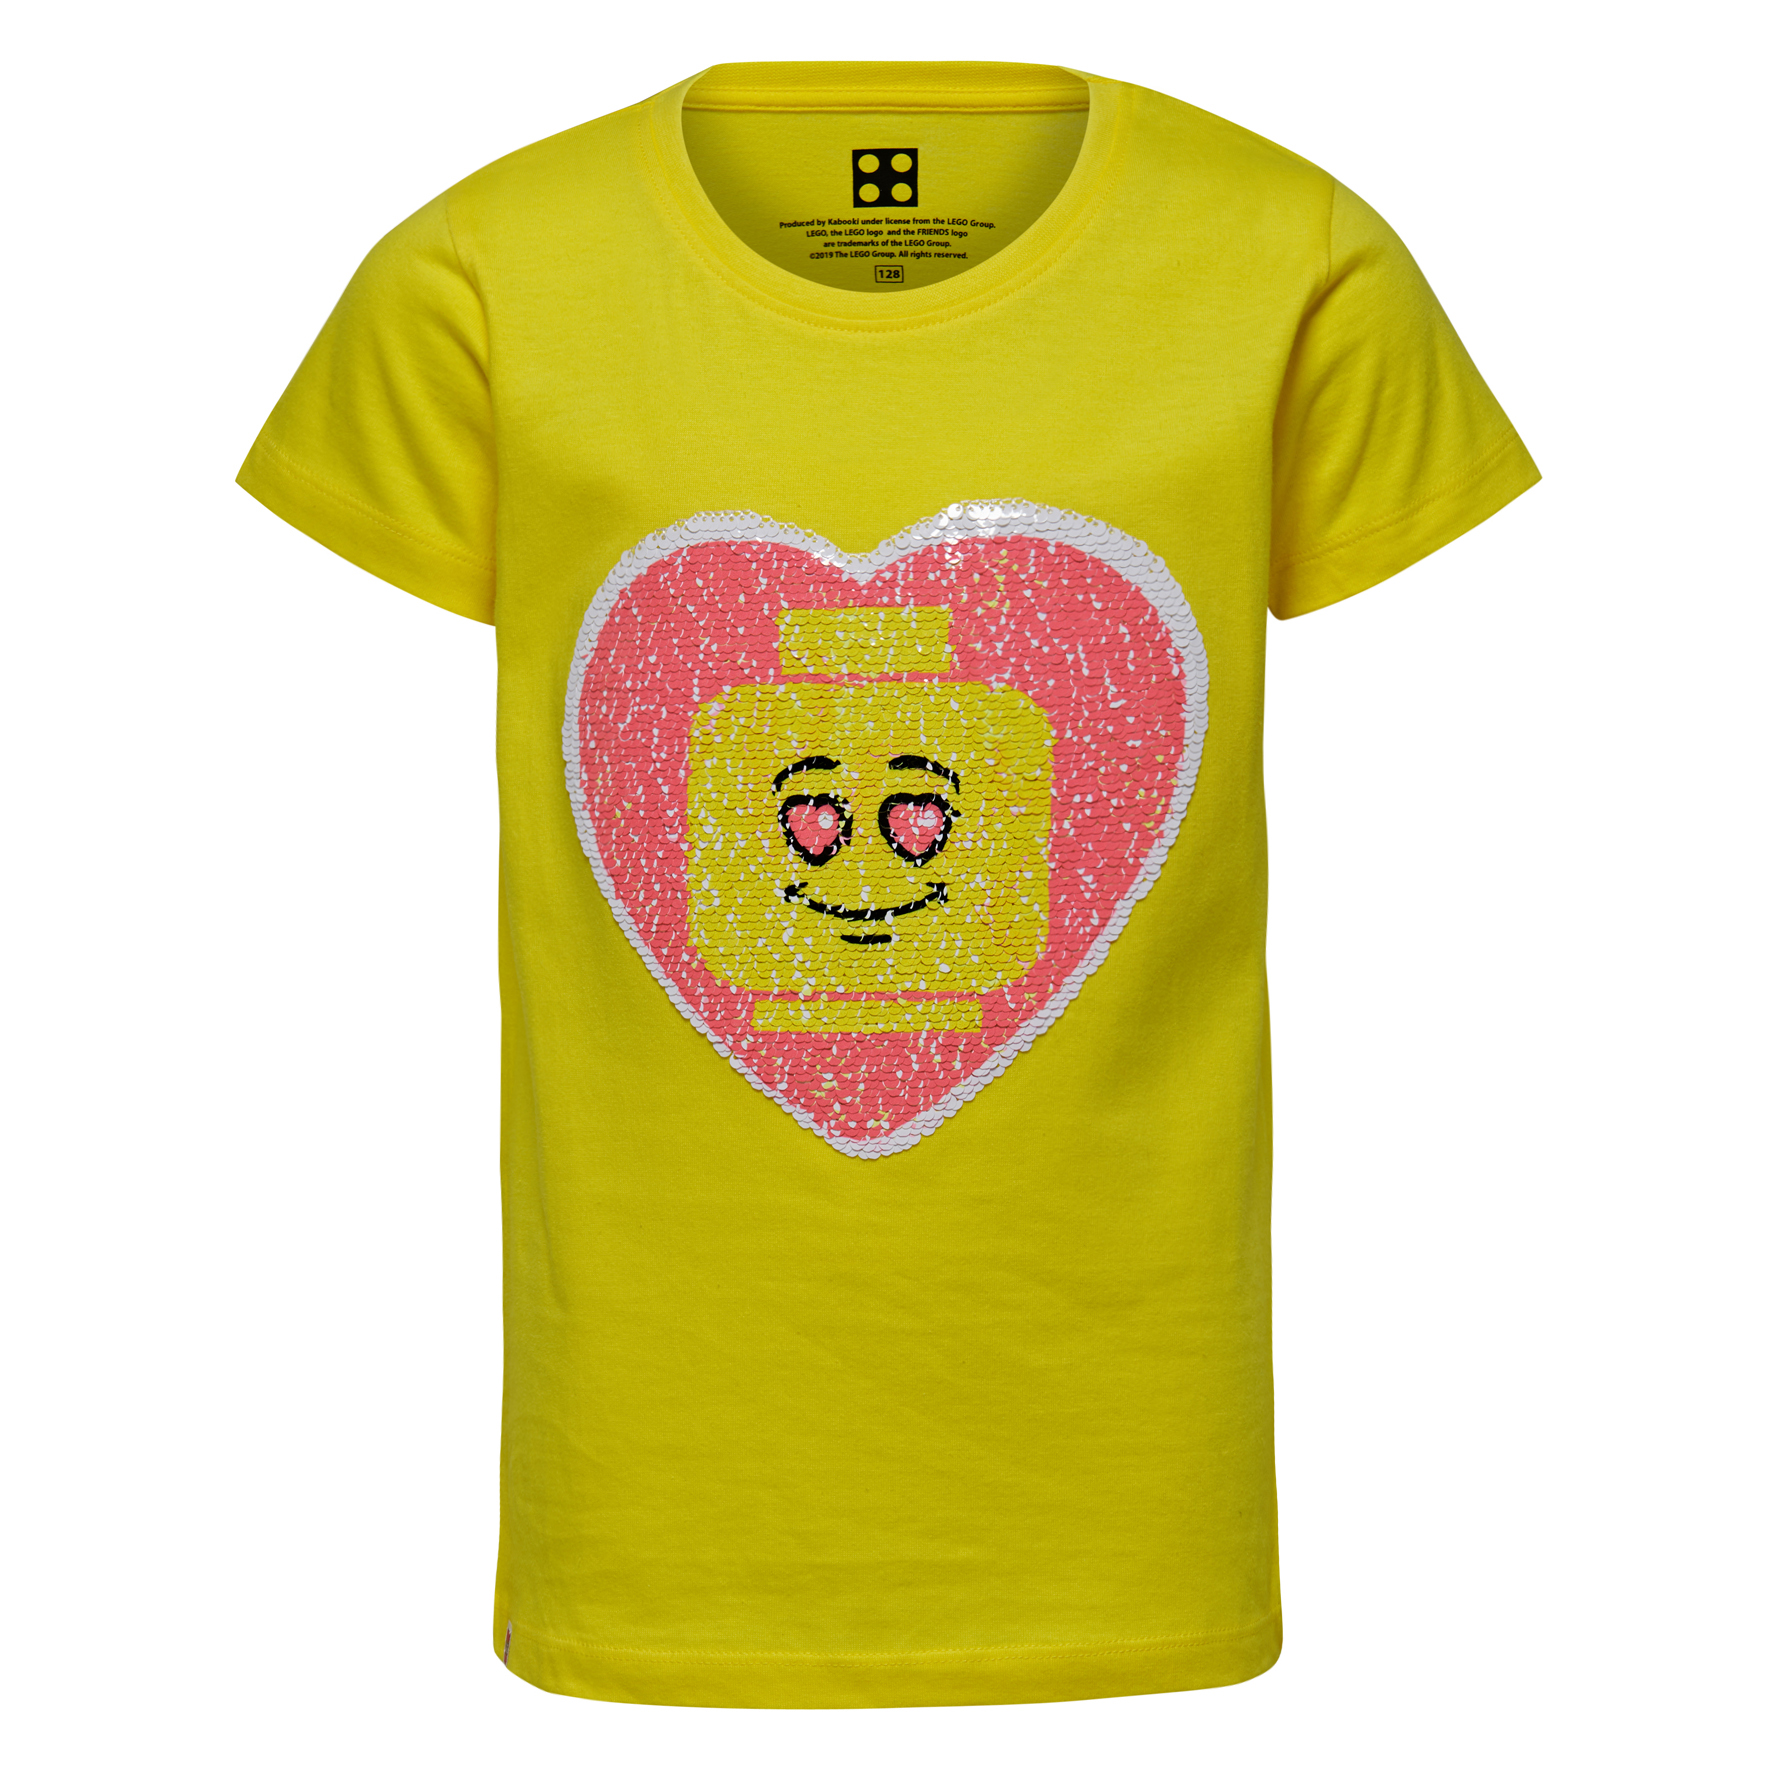 LEGO Wear - Iconic T-shirt - CM-50248